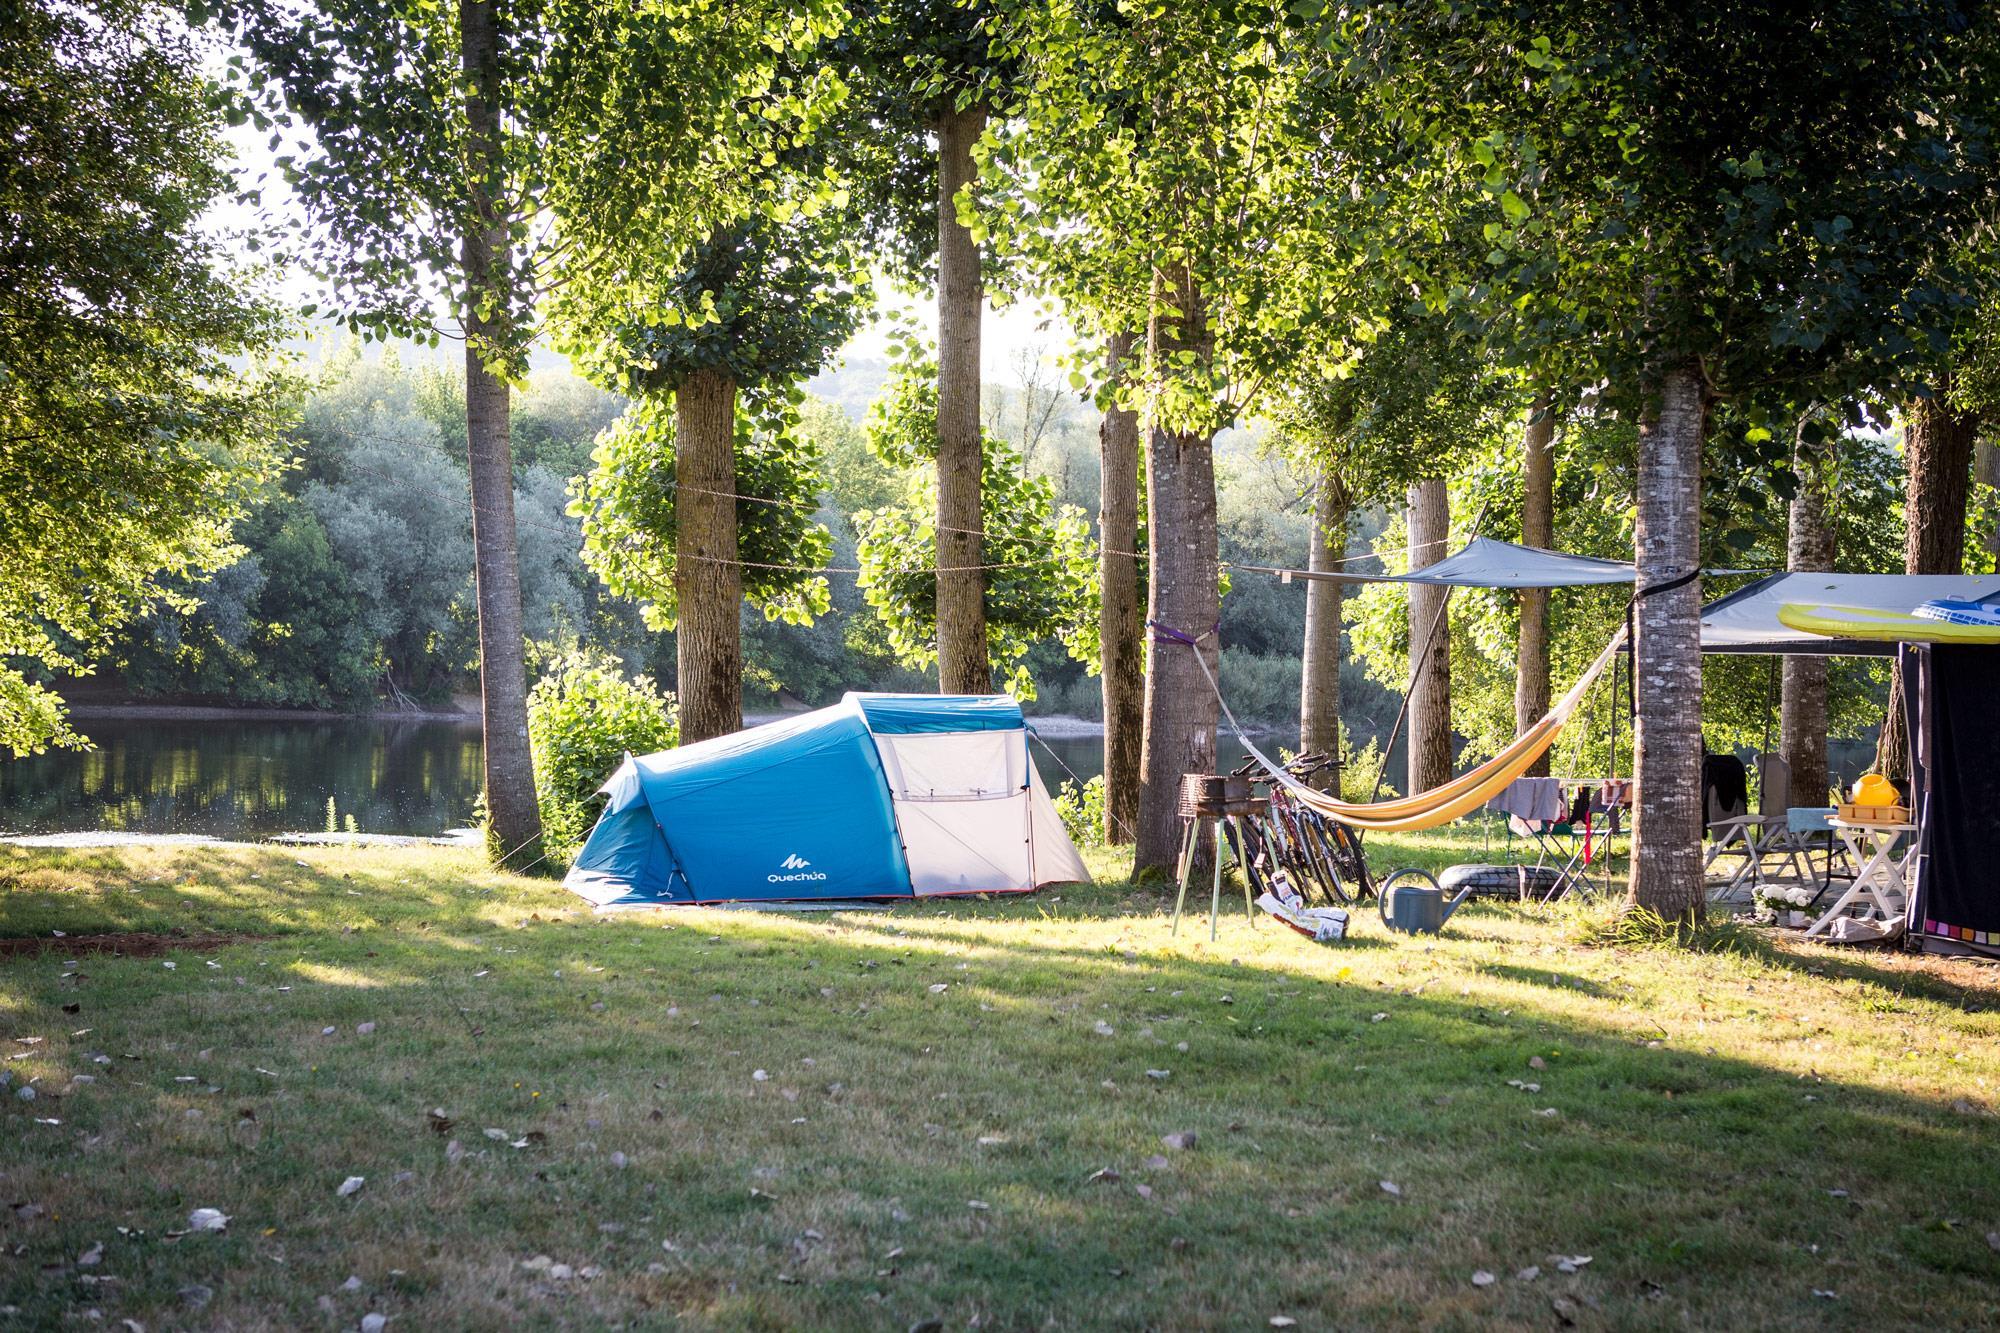 Capfun Camping Beau Rivage, La Roque-Gageac, Dordogne